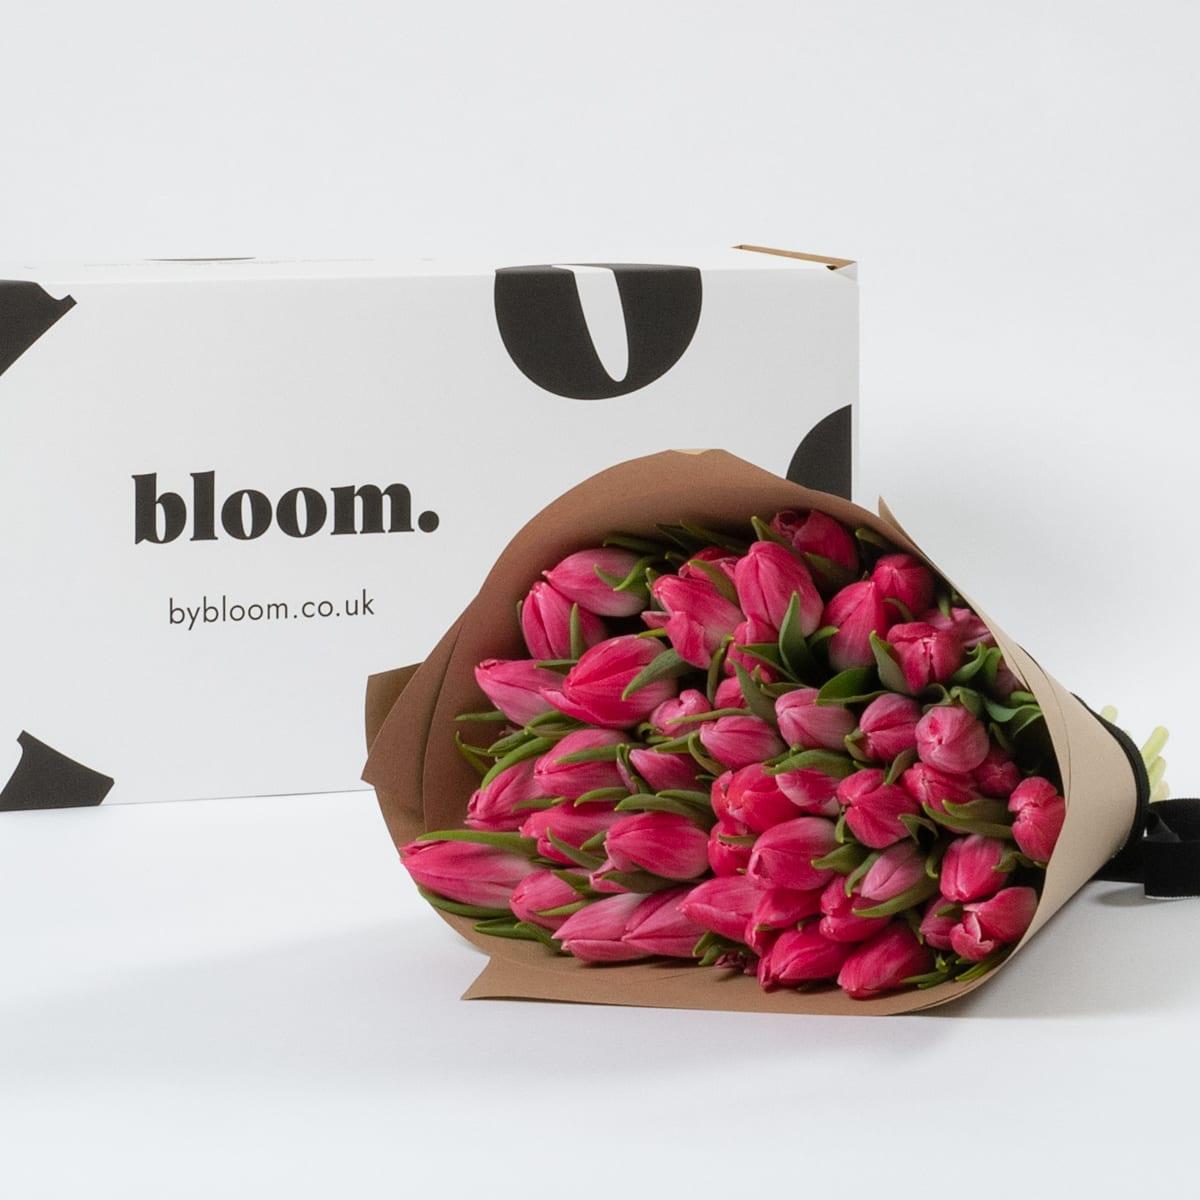 Bloom Flower Delivery | Cerise Pink Tulips